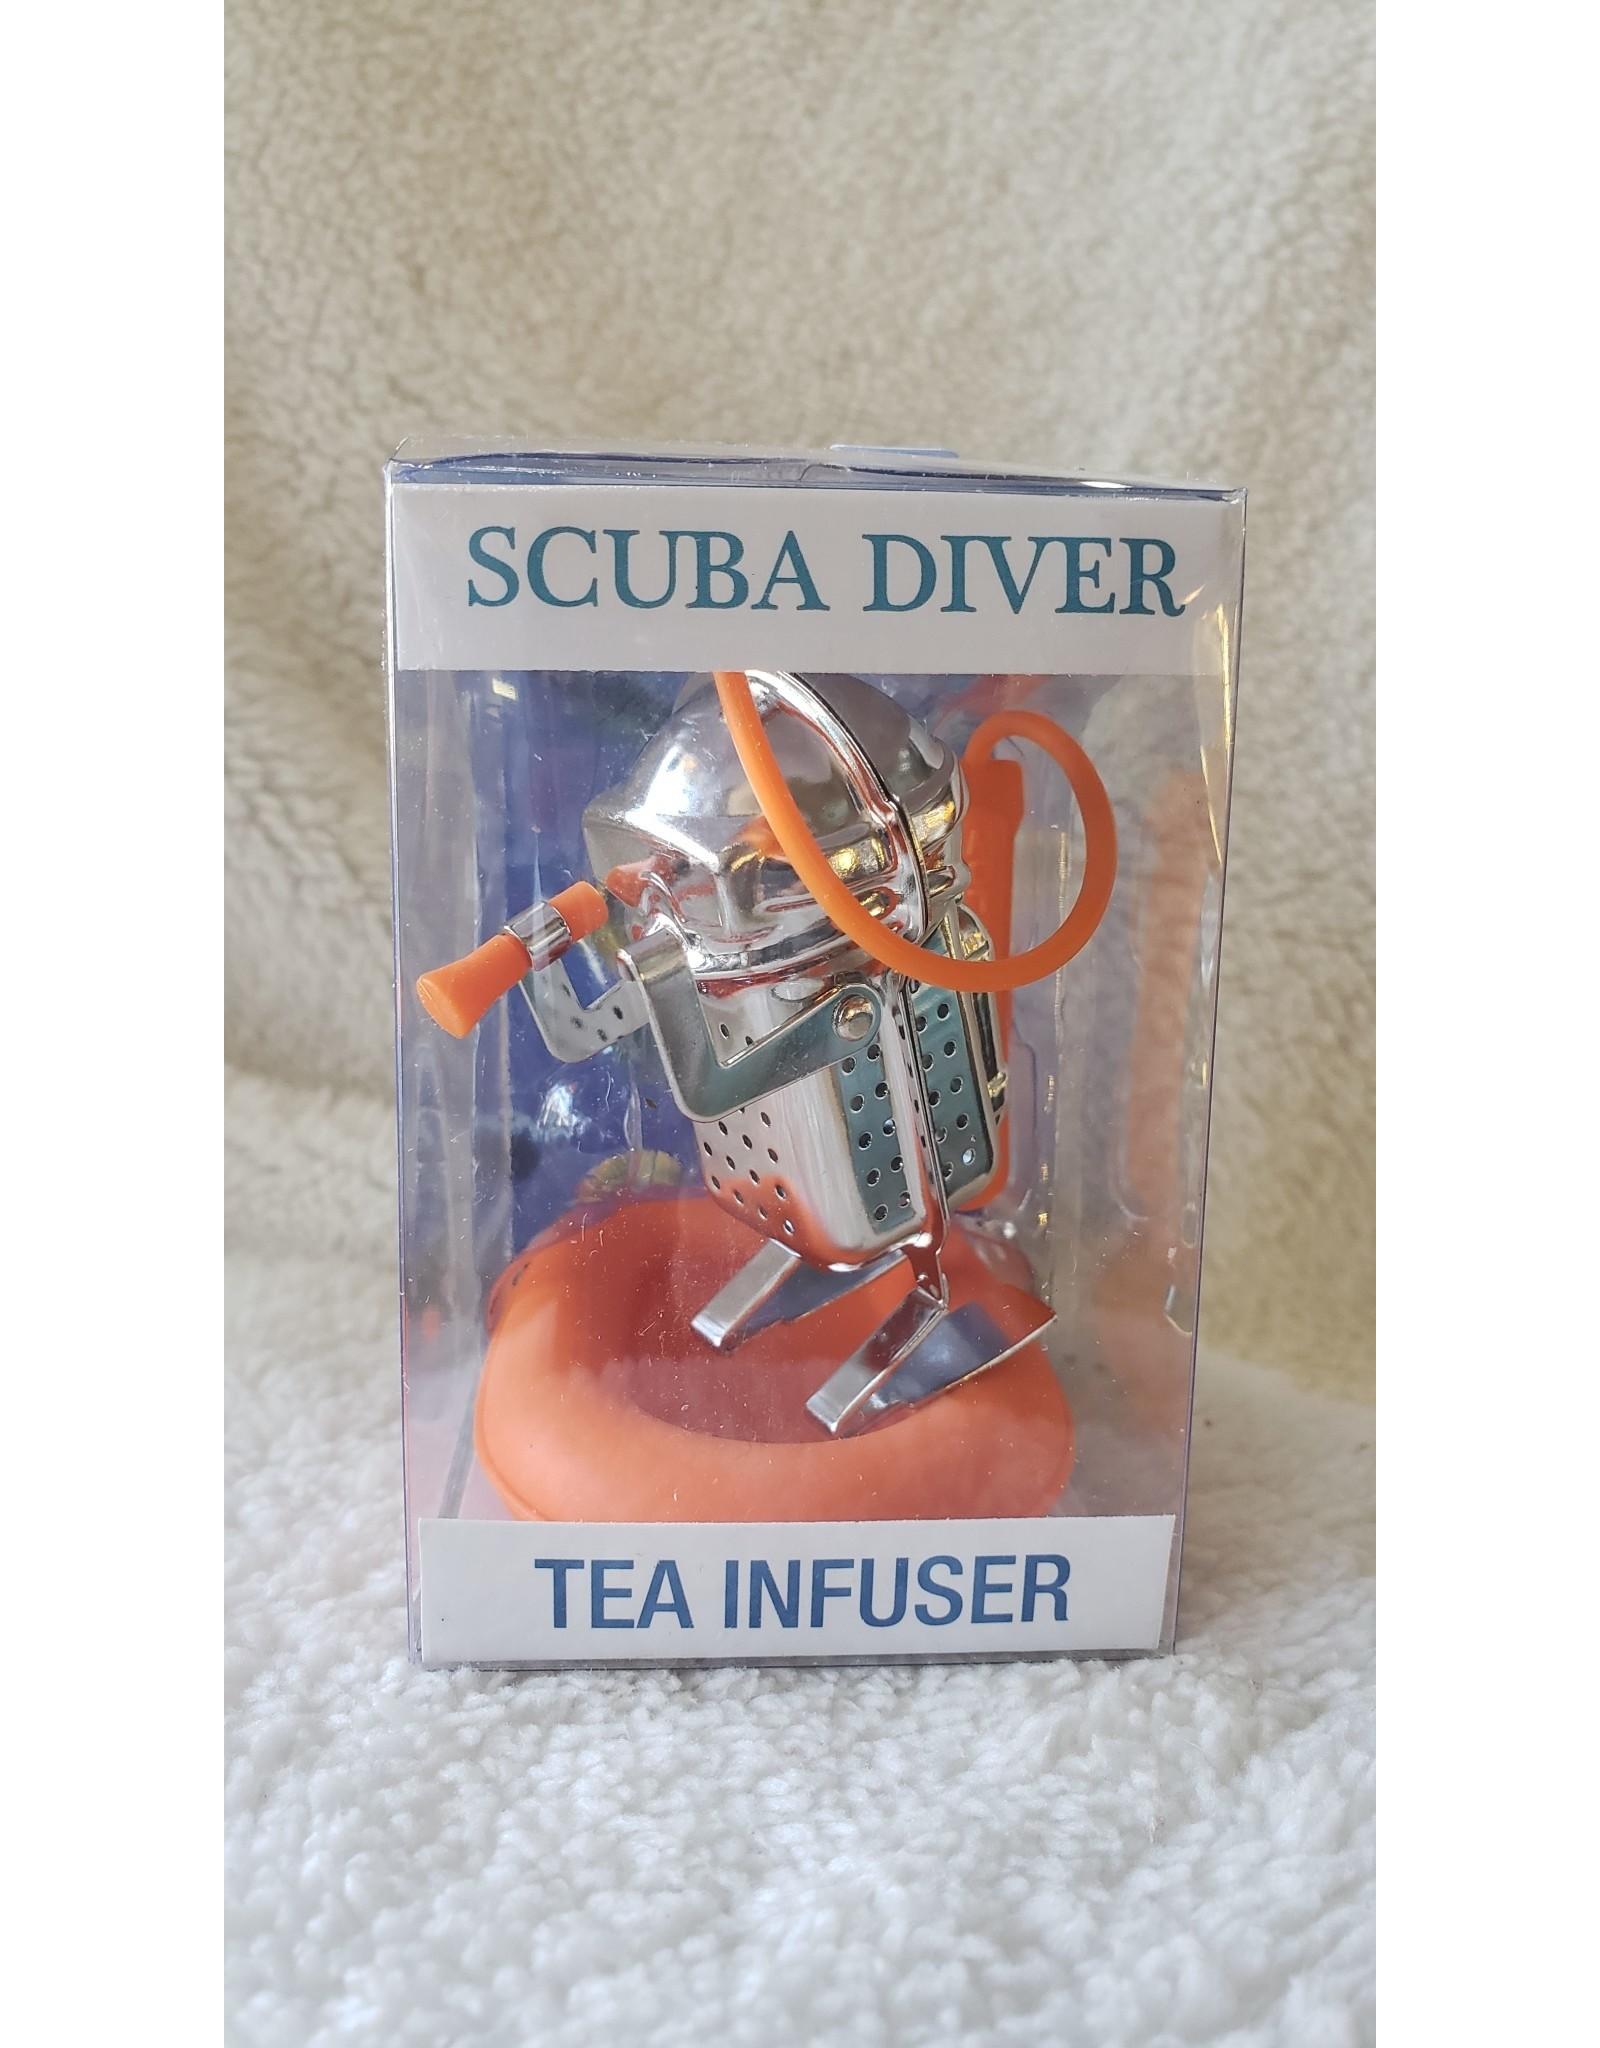 Scuba Diver Tea Infuser